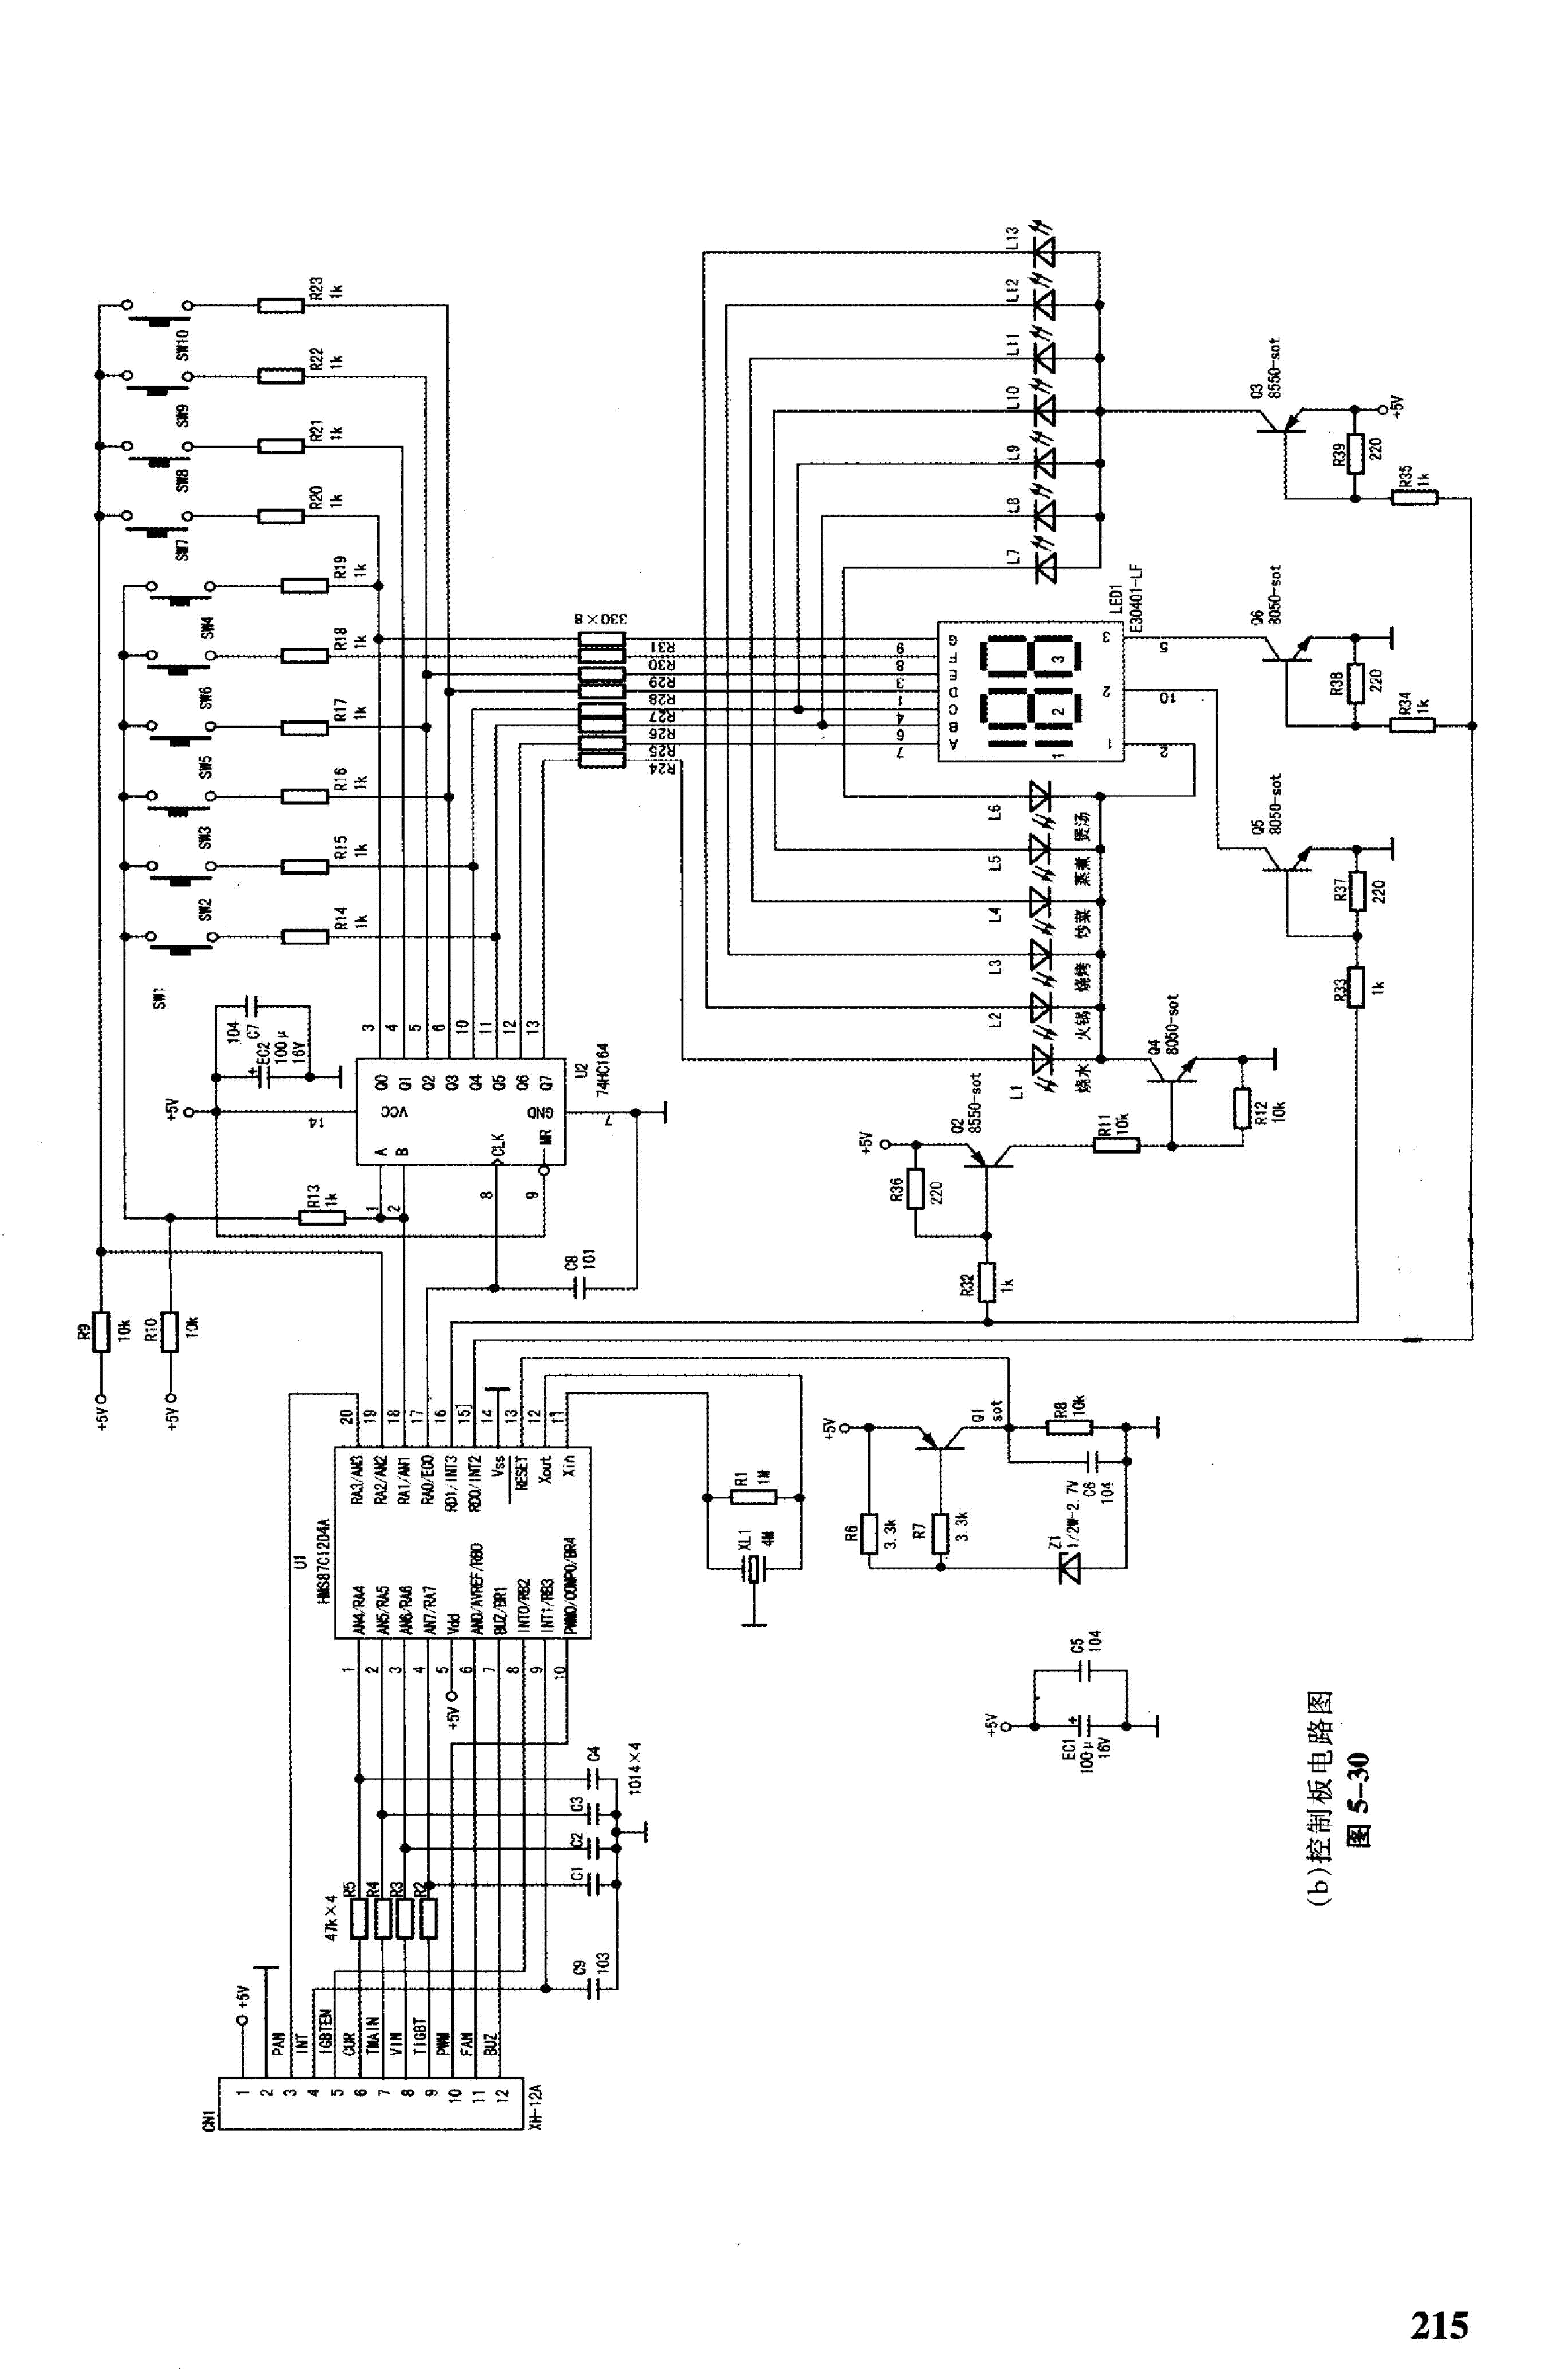 galanz service manual pdf